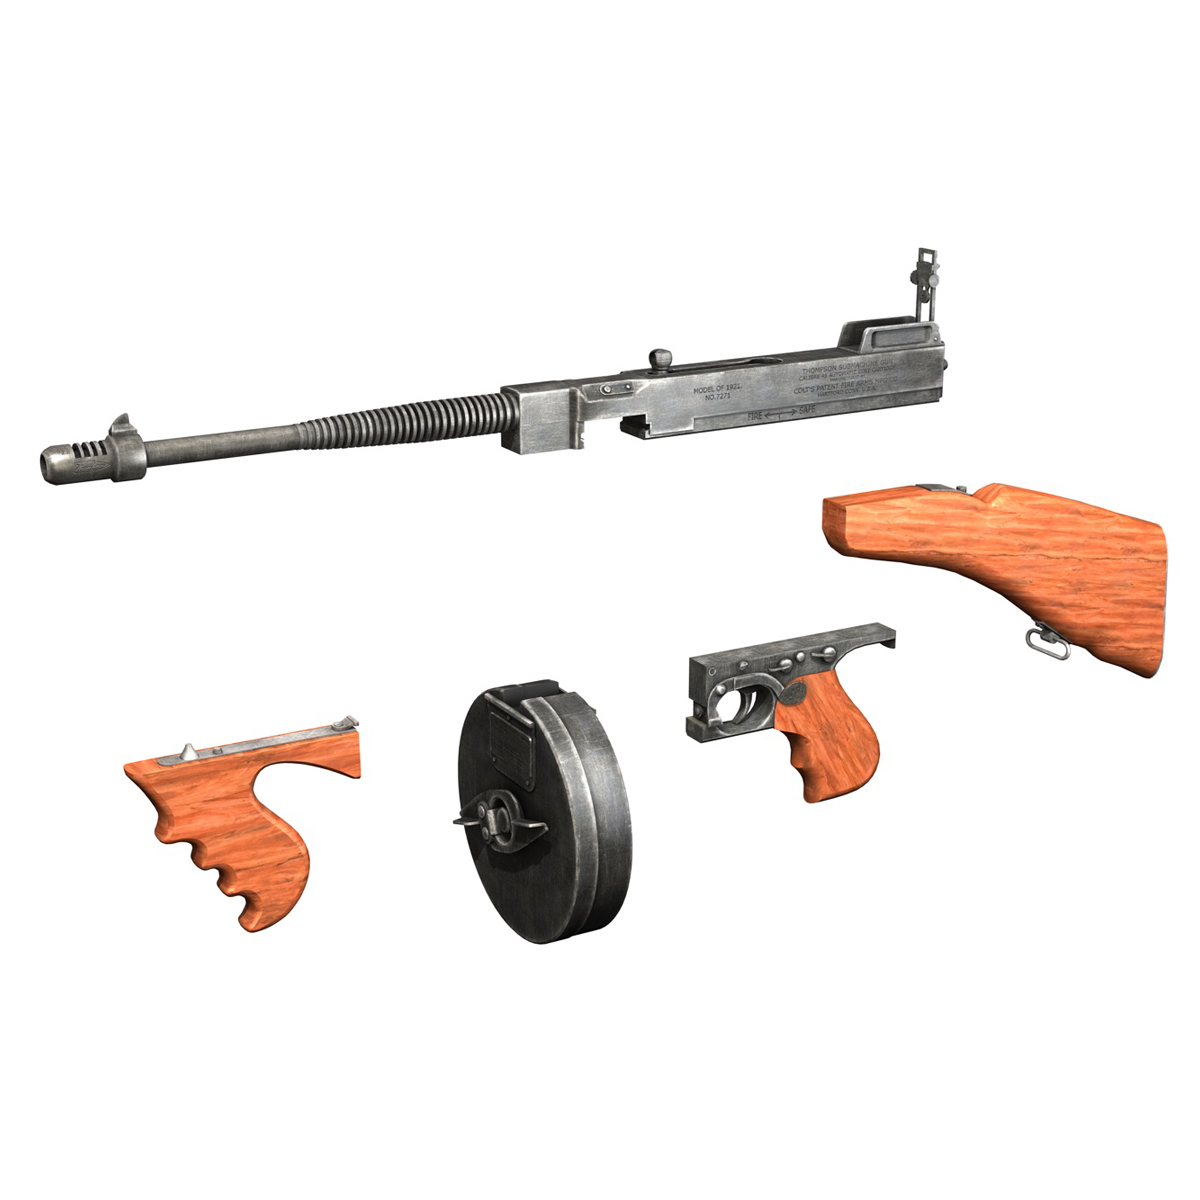 colt model1921 thompson submachine gun 3d model 3ds c4d lwo obj 264714